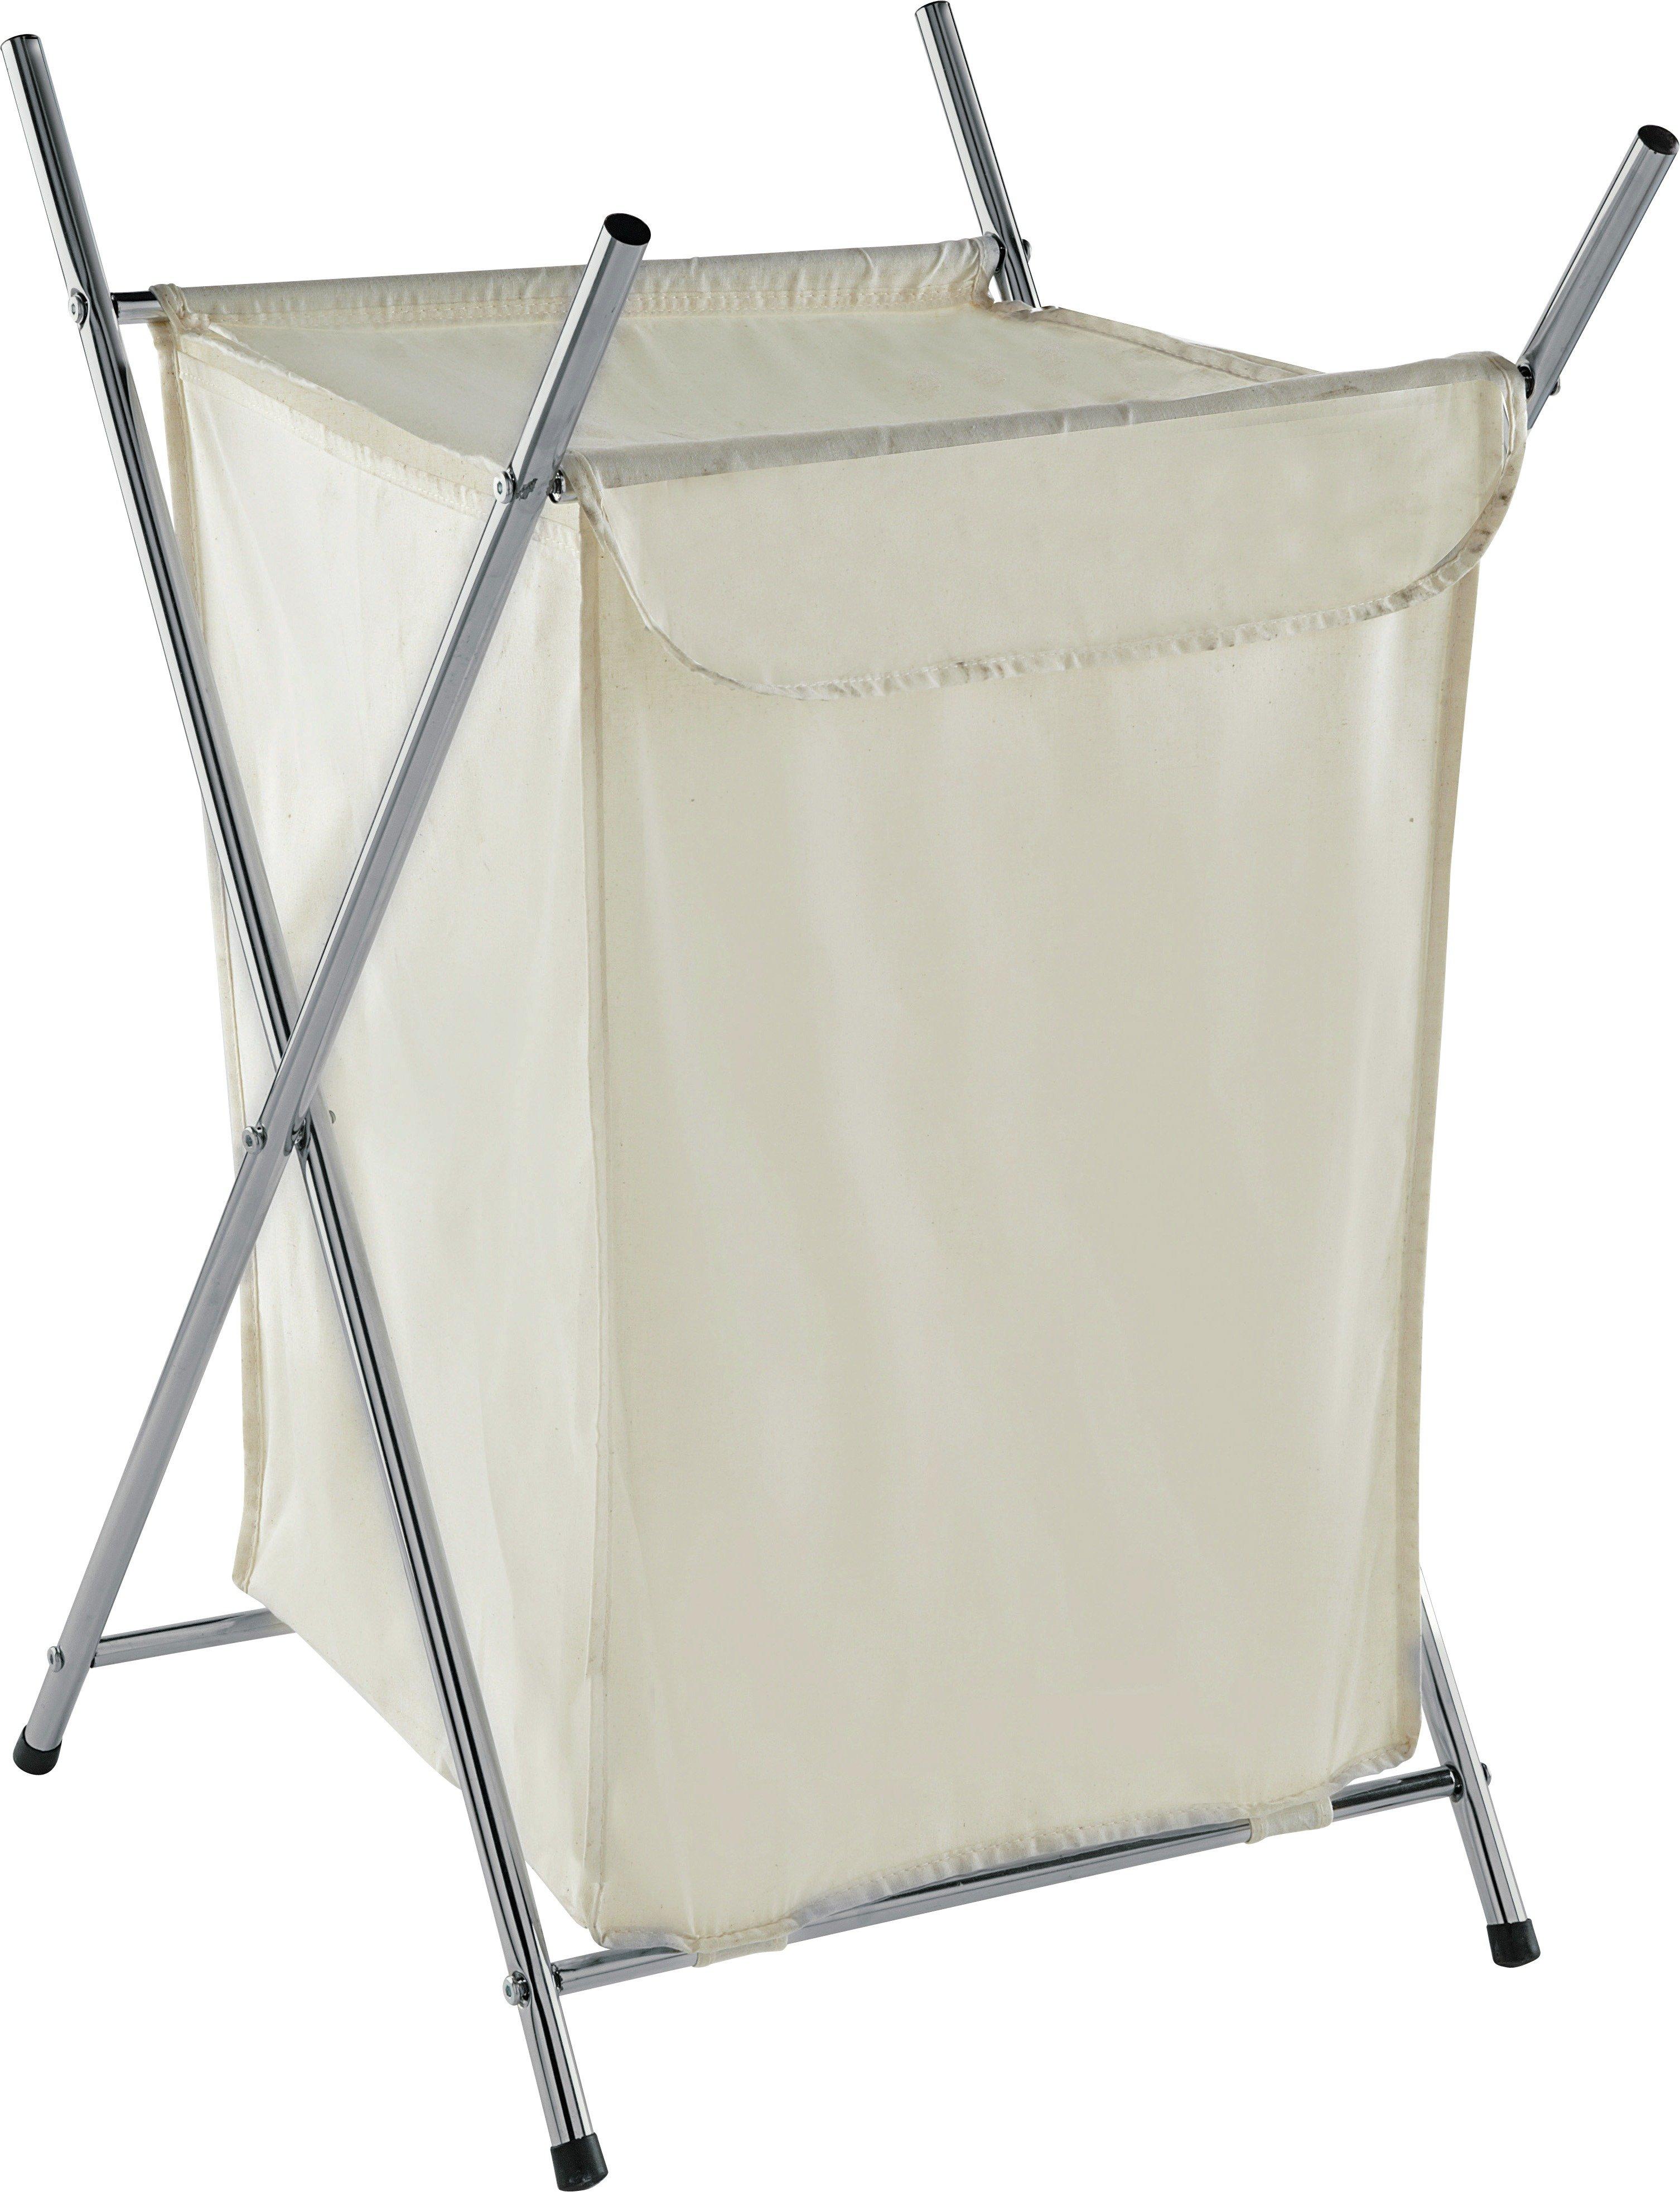 home-75-litre-chrome-folding-laundry-basket